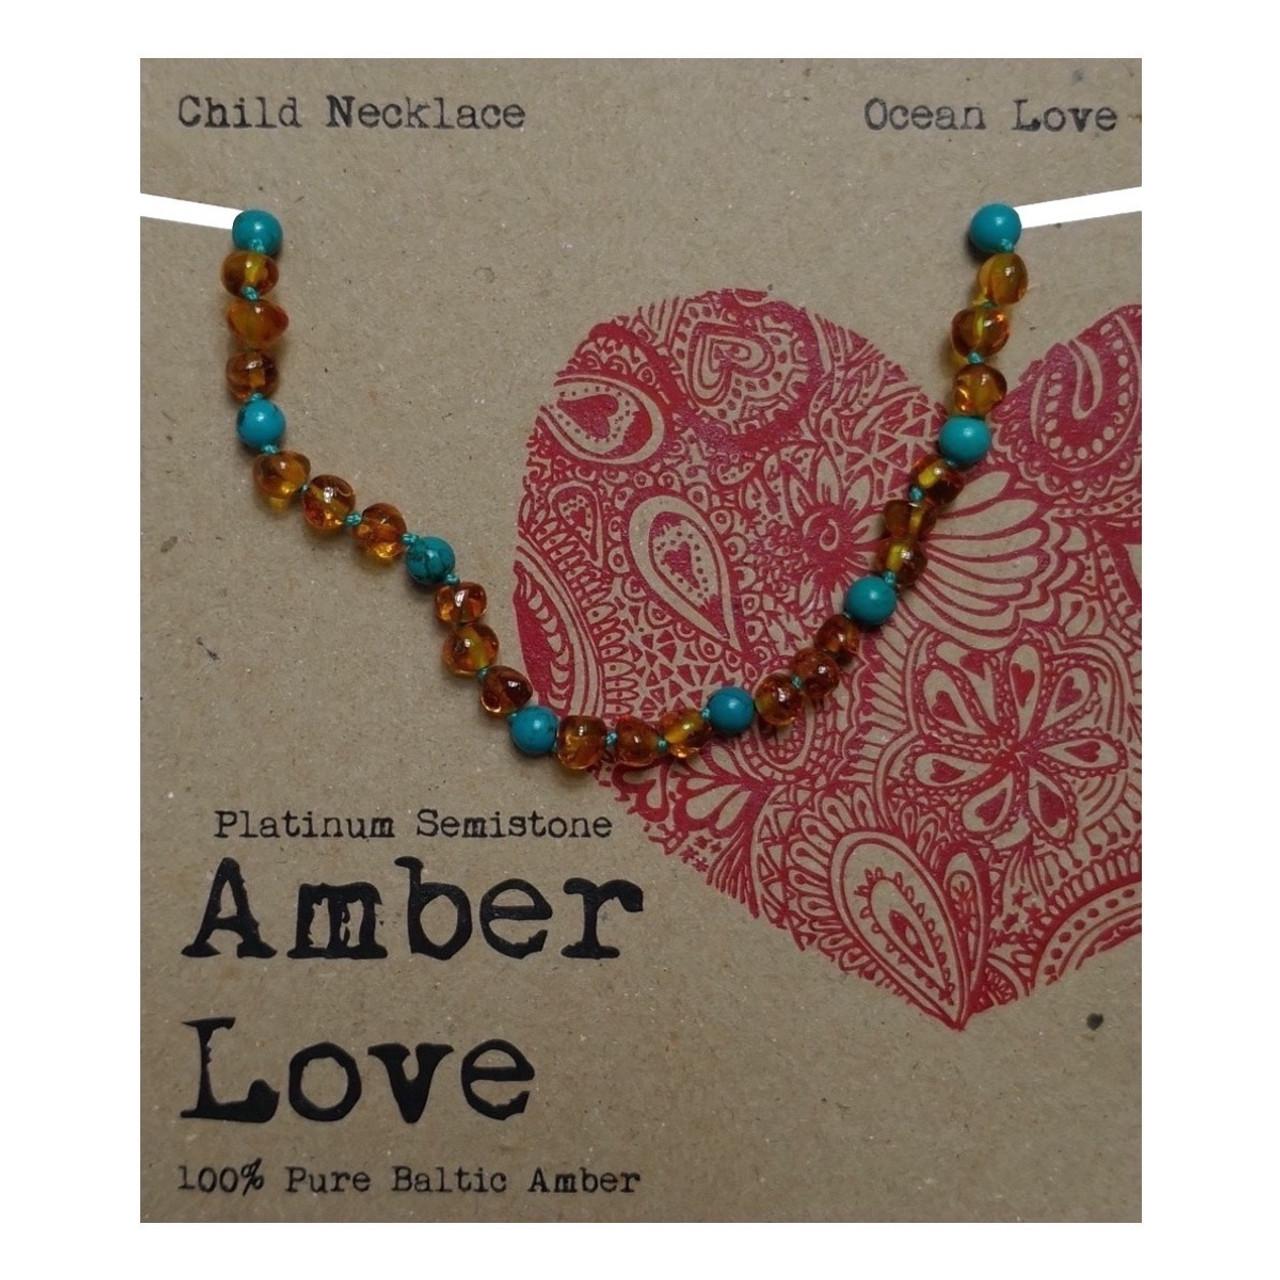 Amber Love Baltic Amber and Semi Precious Stone Child Necklace